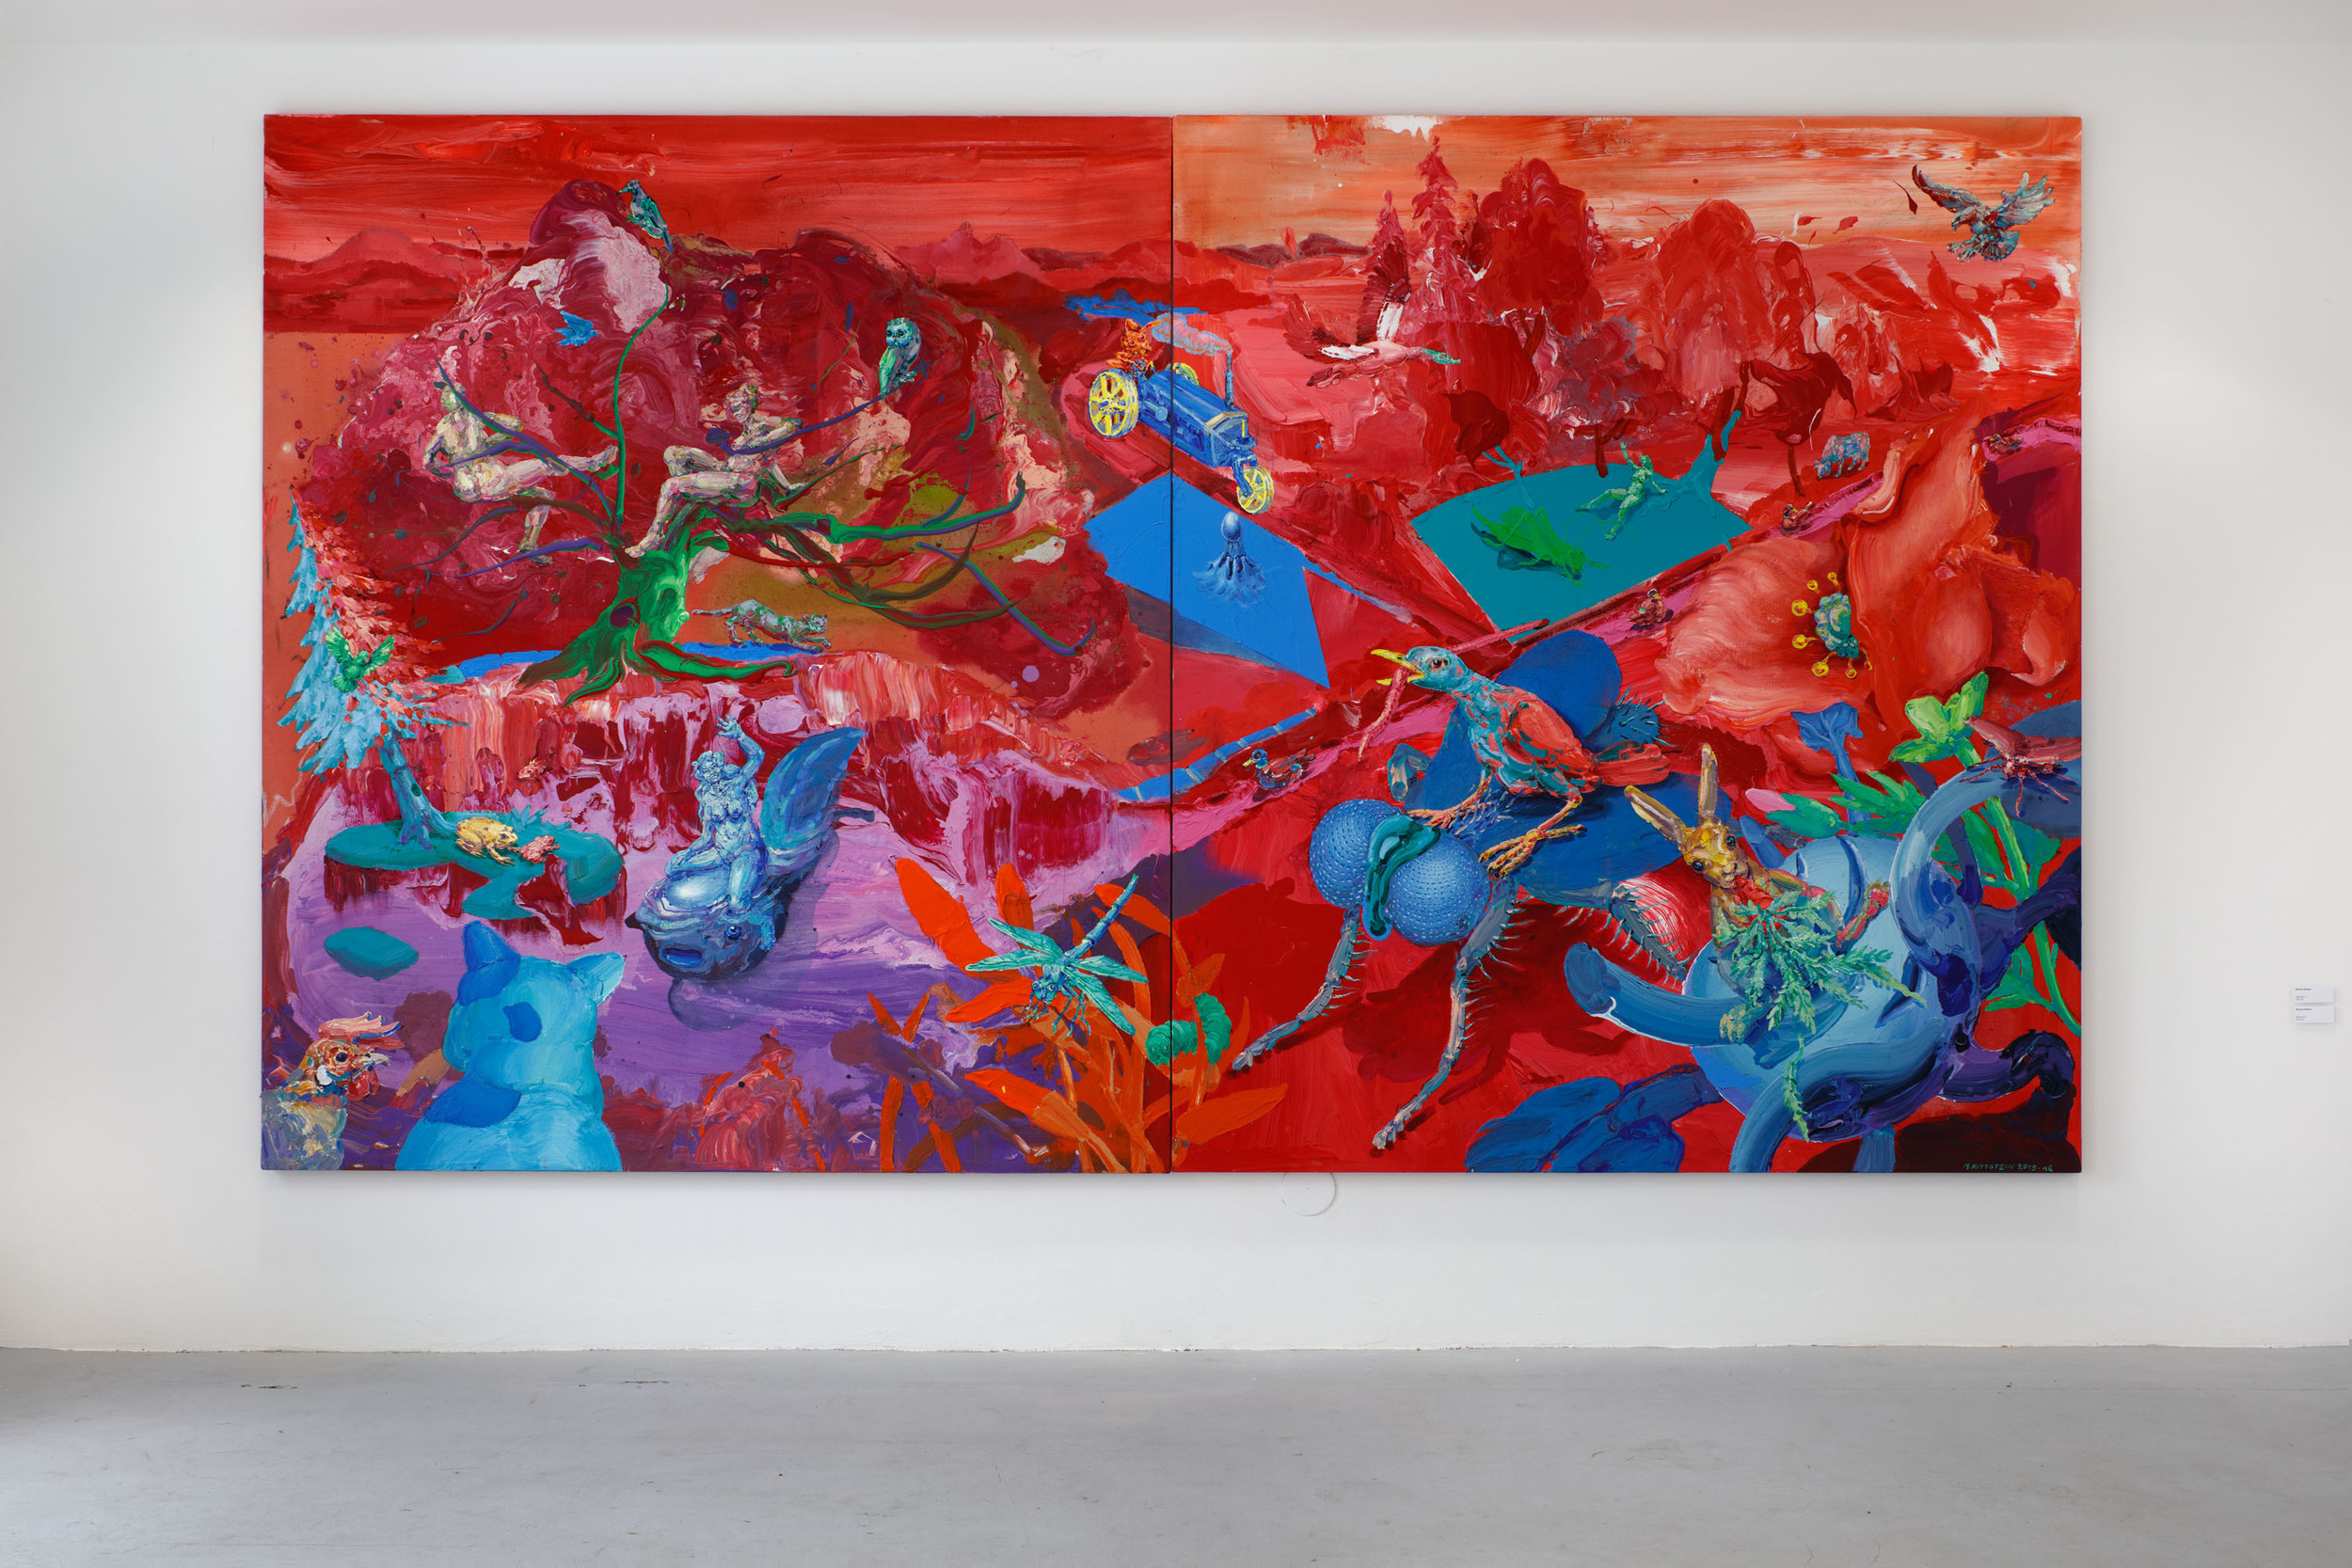 Michael Rittstein, Asimilace I., 2015–16 plátno, akryl, 190 x 220 cm 338 000 Kč    Michael Rittstein, Asimilace II., 2015–16 plátno, akryl, 190 x 220 cm